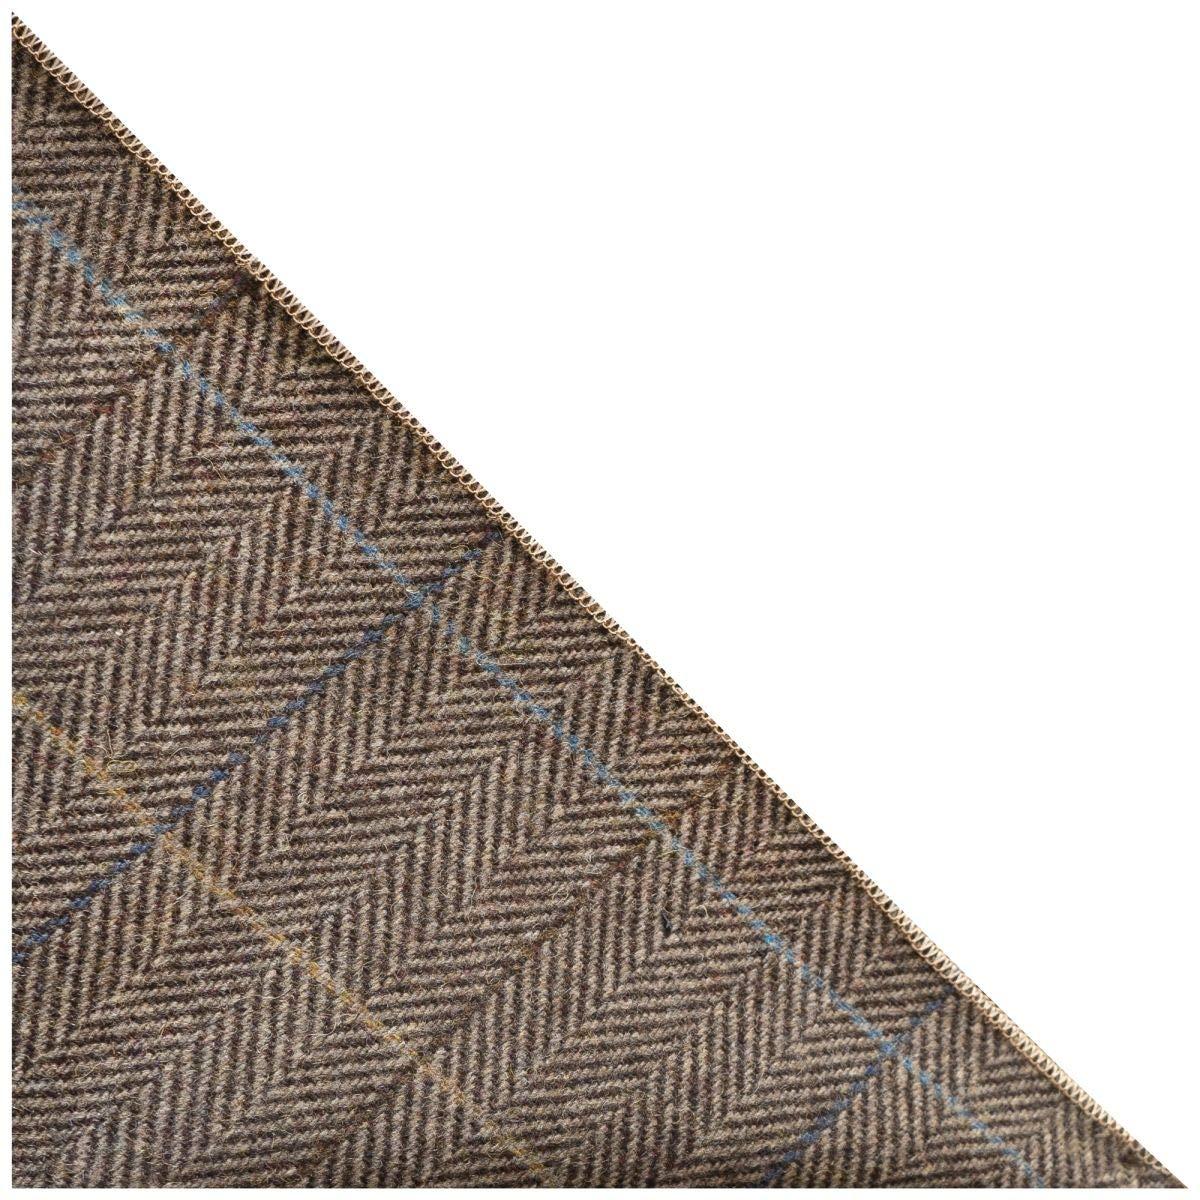 Handkerchief Tweed Luxury Dijon Herringbone Check Pocket Square